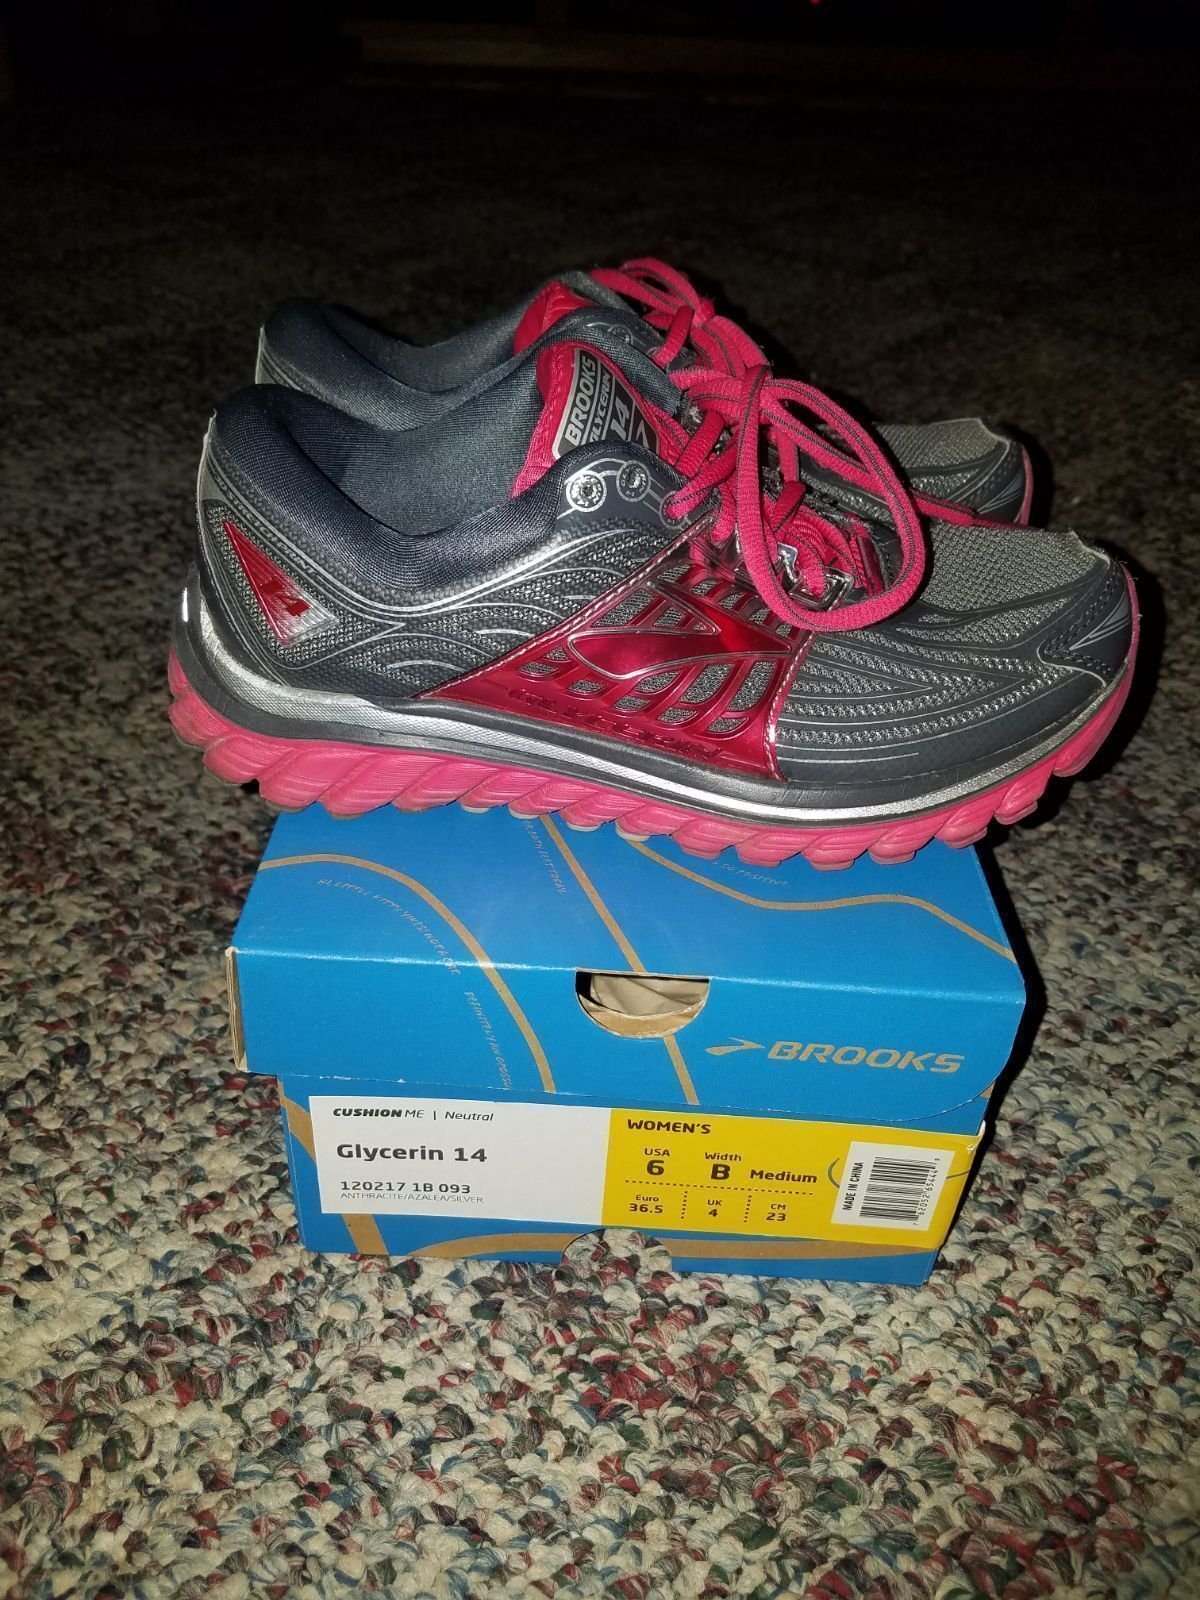 231ad92ac75cb Brooks glycerin 14 women s shoes - Mercari  The Selling App